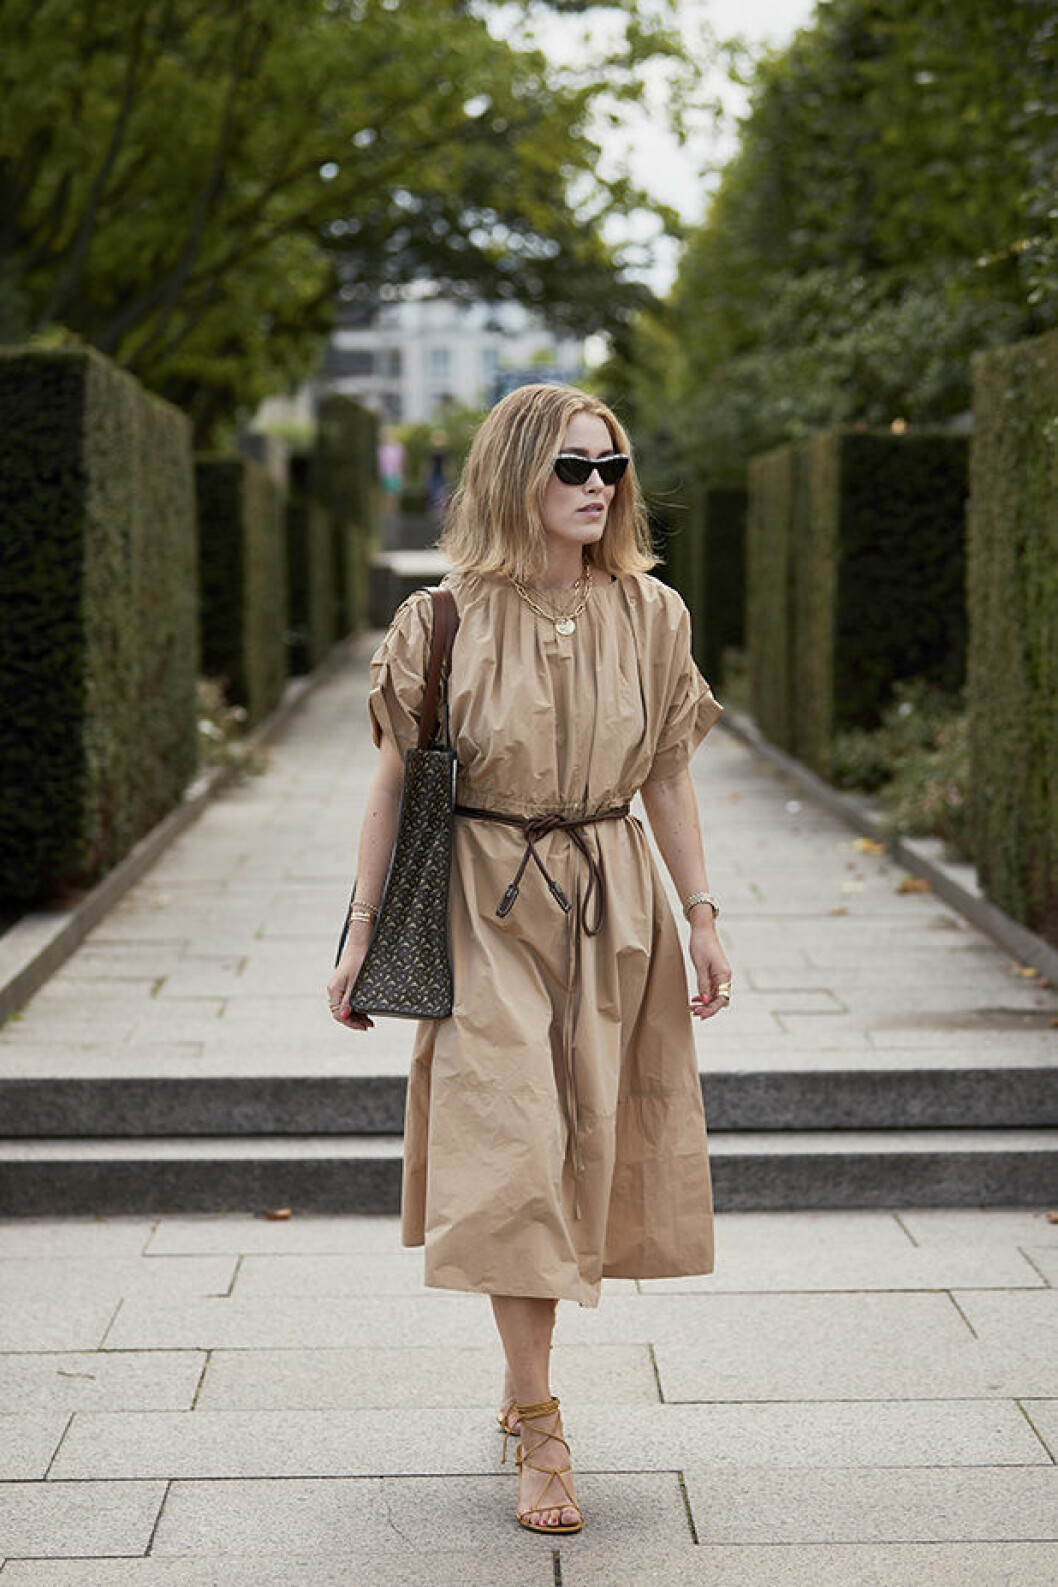 Beige streetstyleinspiration från modeveckan i Köpenhamn.